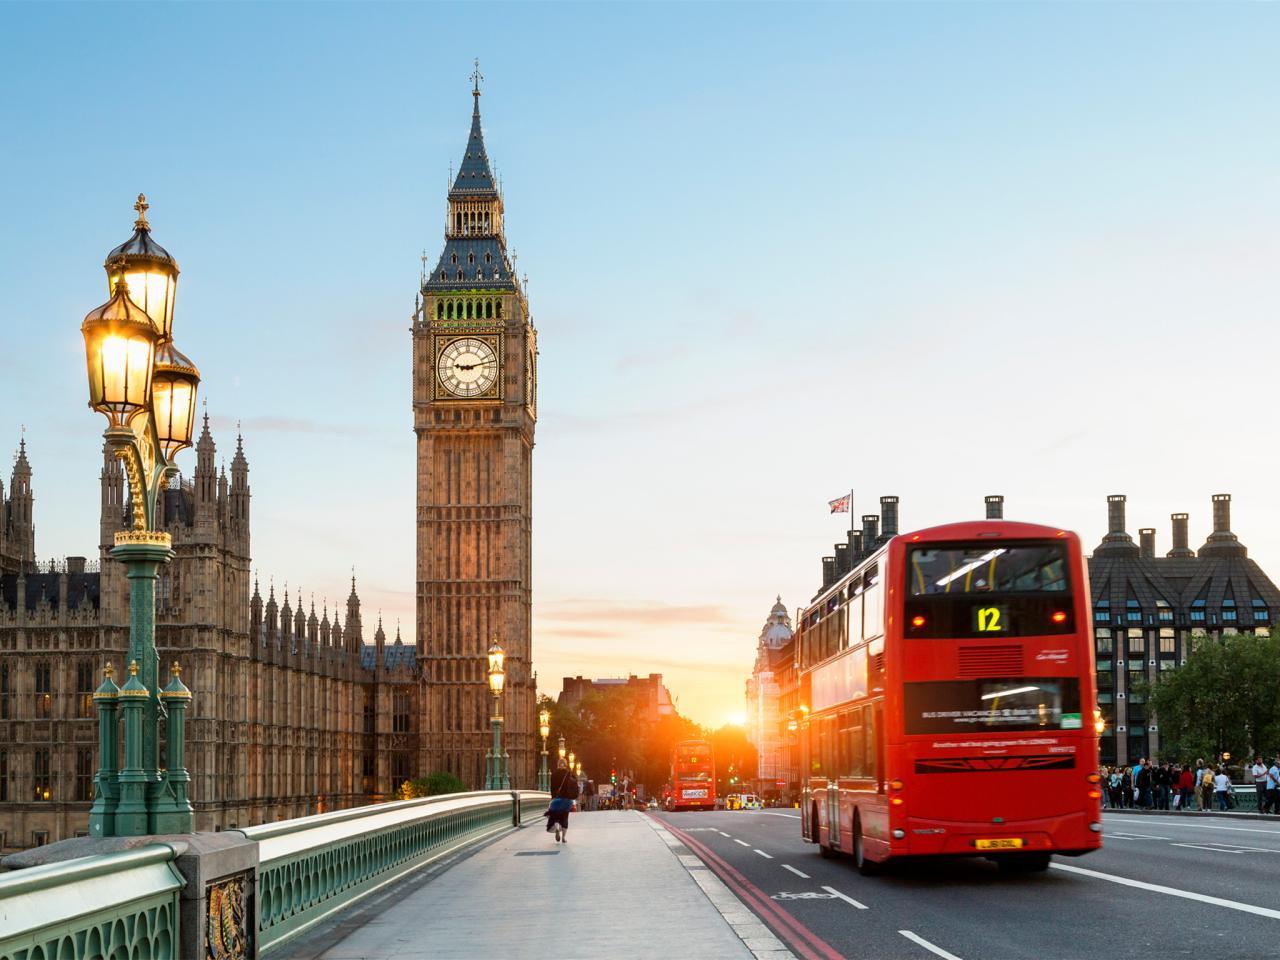 bb-london-travel-bucket-list.jpg